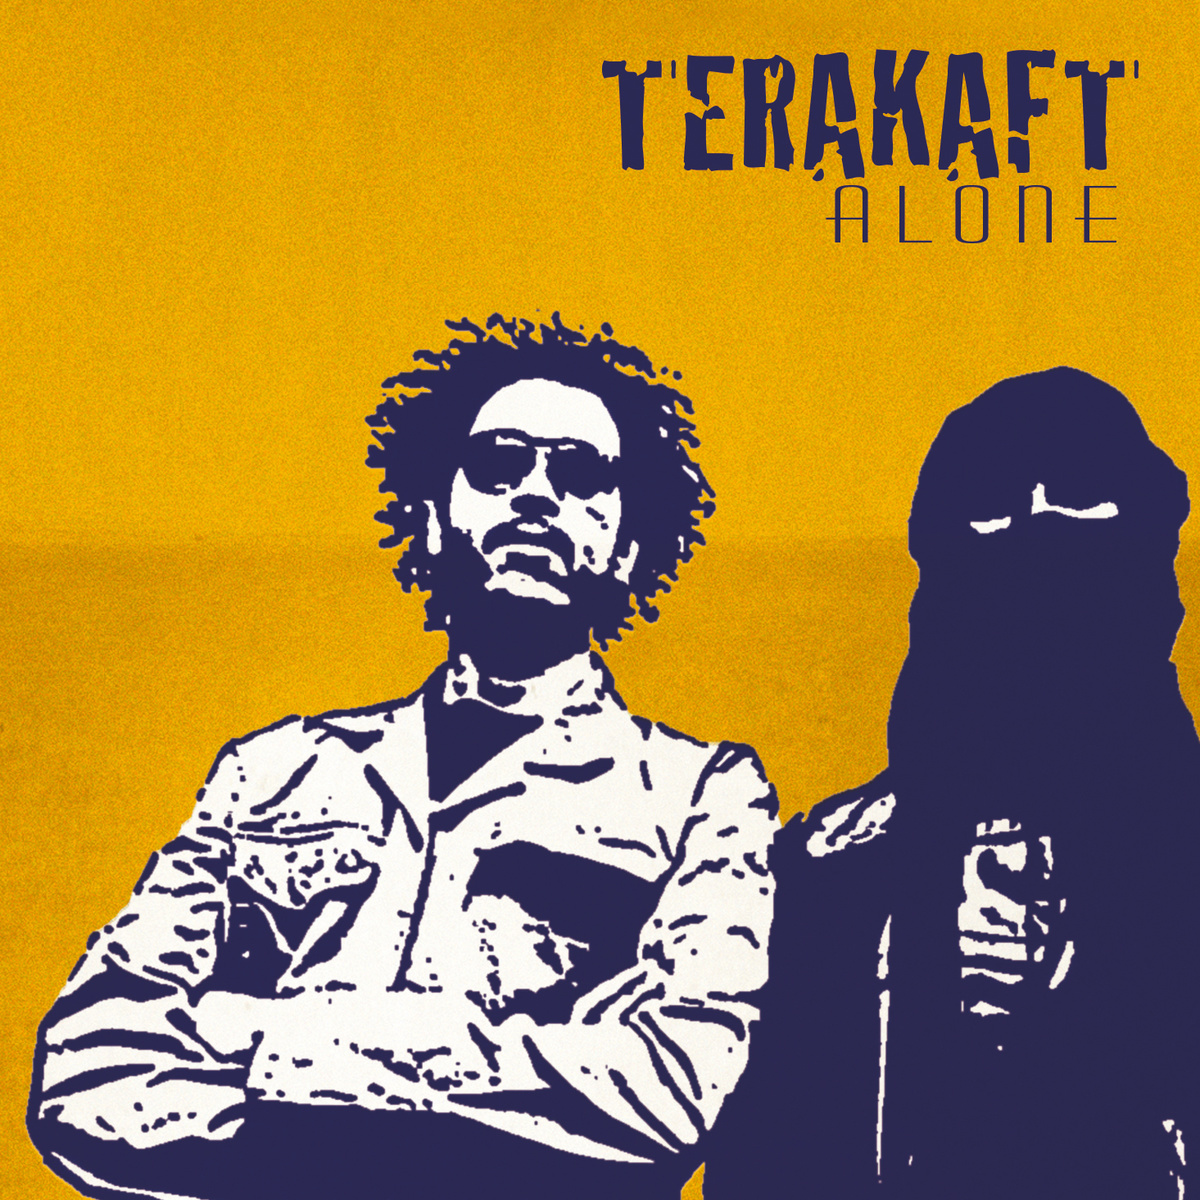 TERAKRAFT - ALONE (TÉNÉRÉ) (OUT HERE RECORDS, 2015)